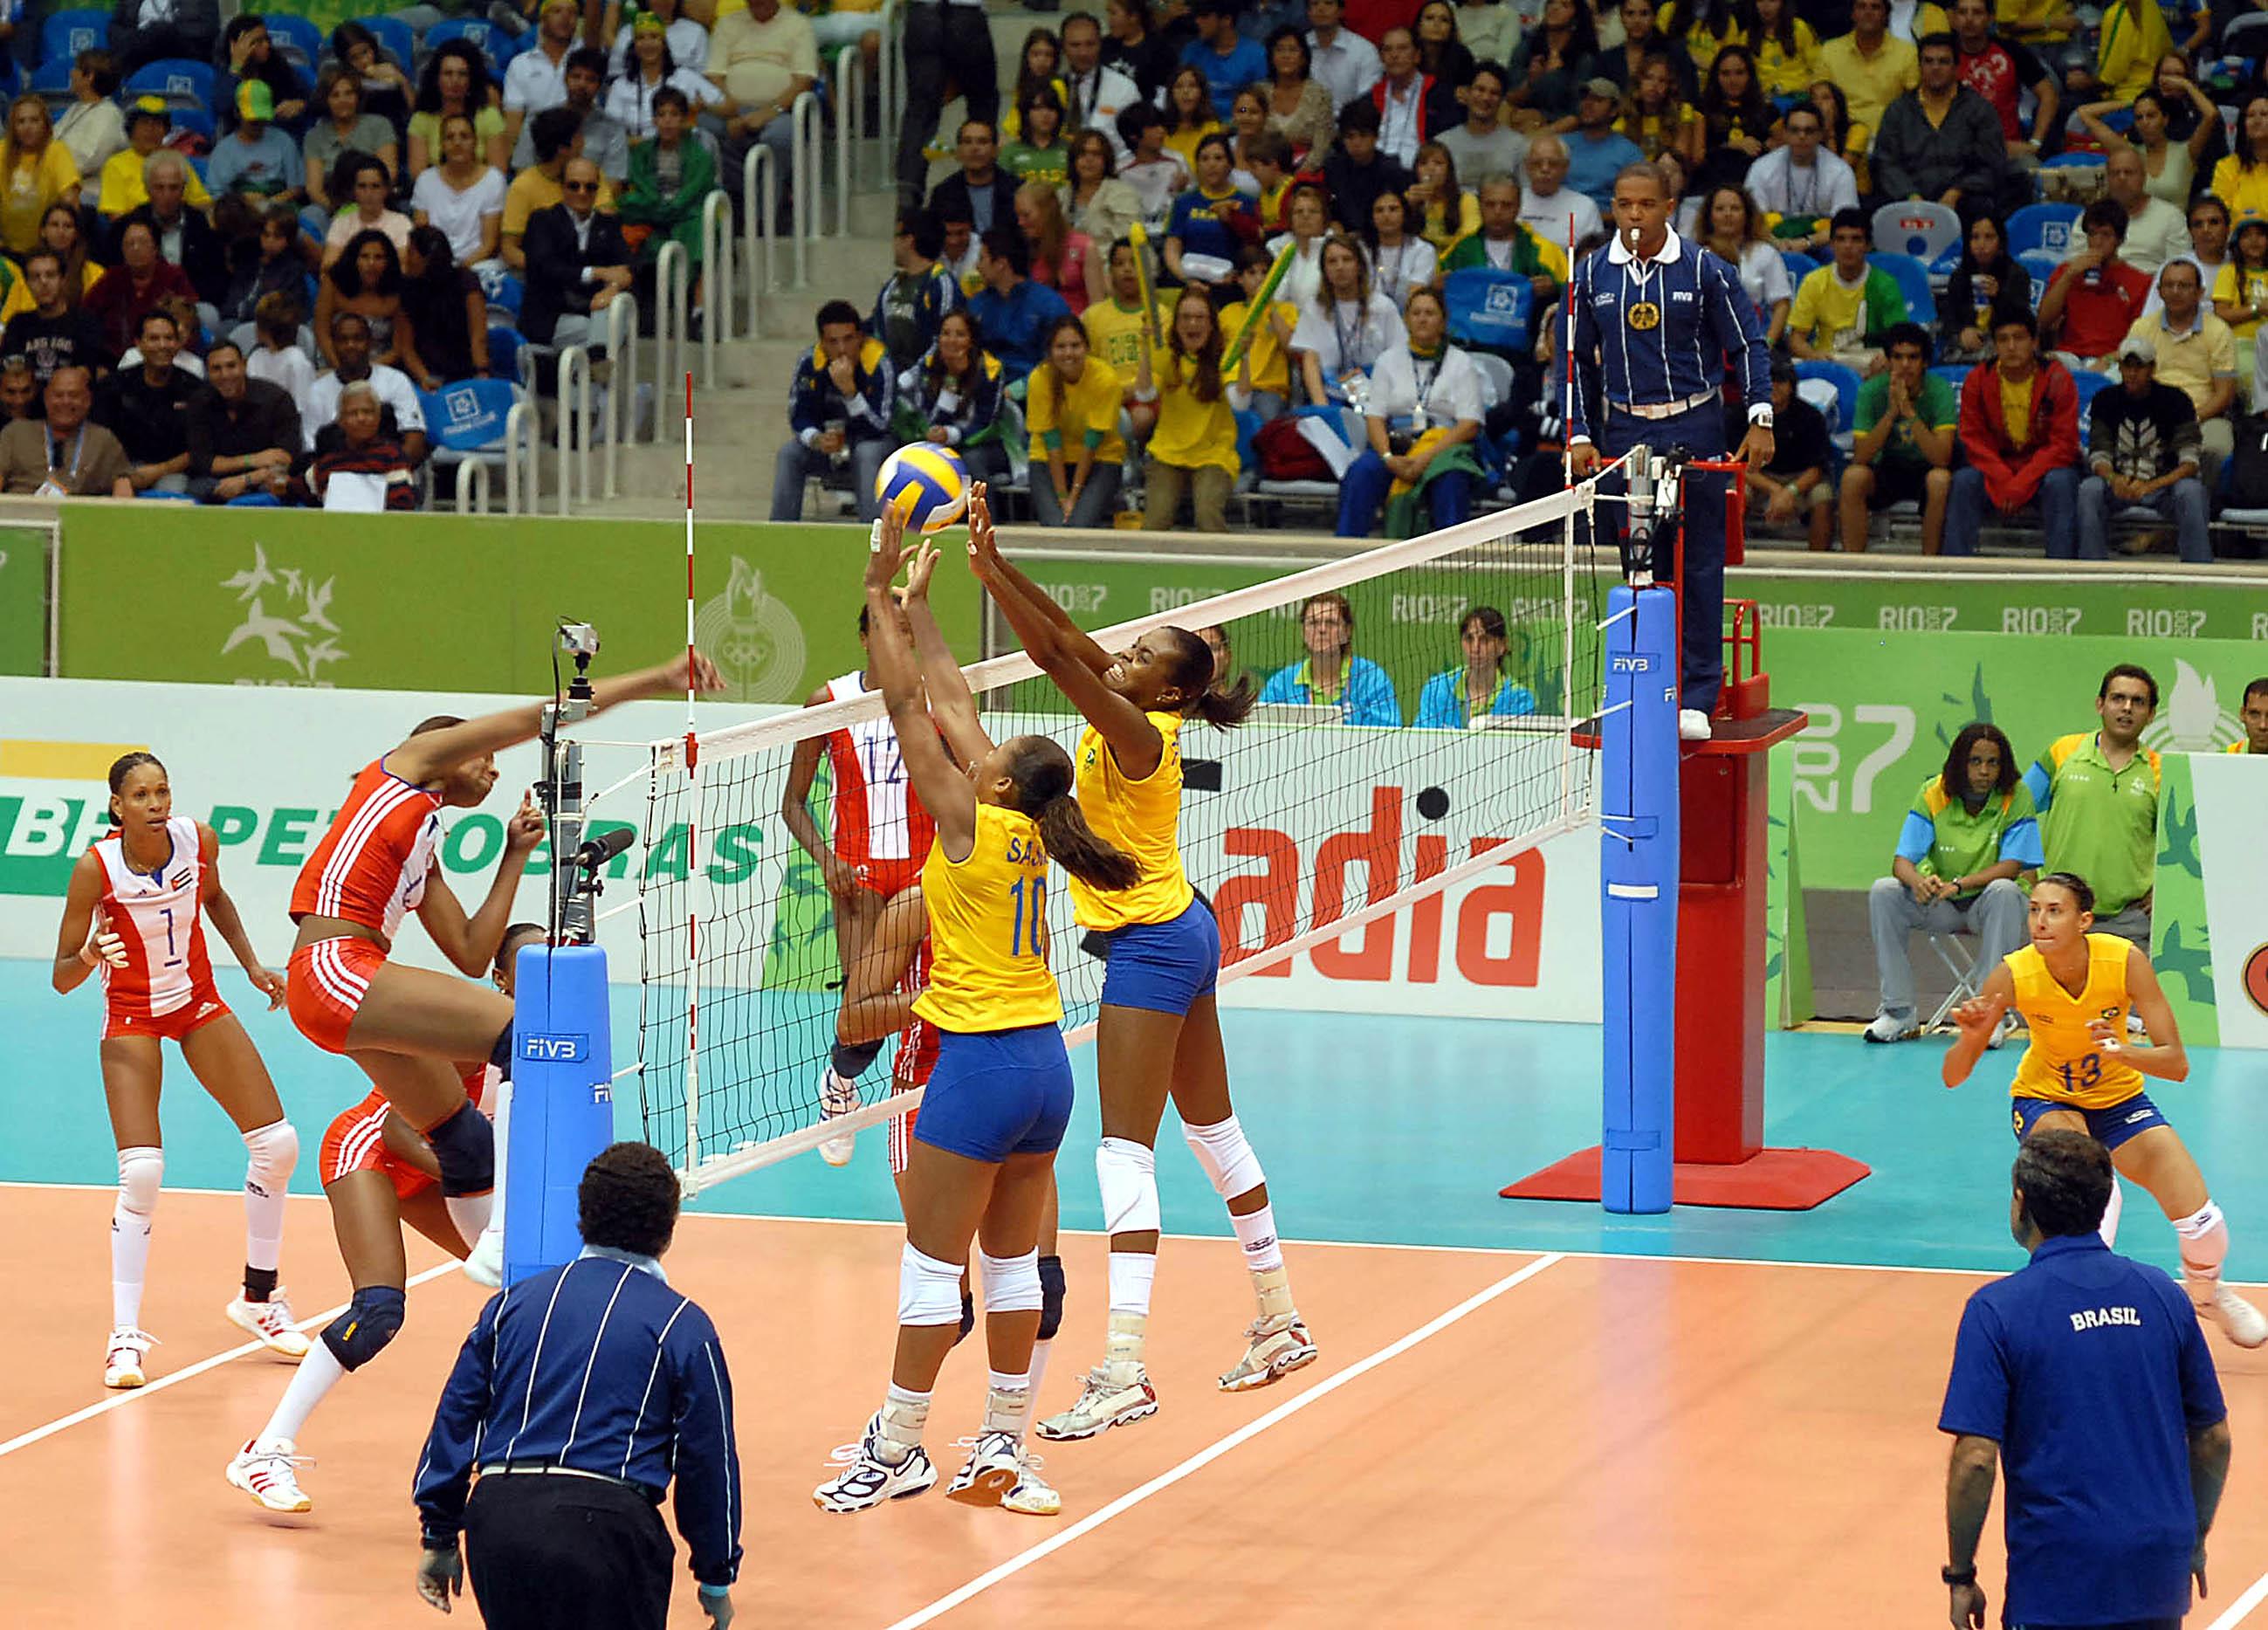 http://upload.wikimedia.org/wikipedia/commons/8/8e/Women%27s_Volleyball_-_BRA_vs._CUB.jpg